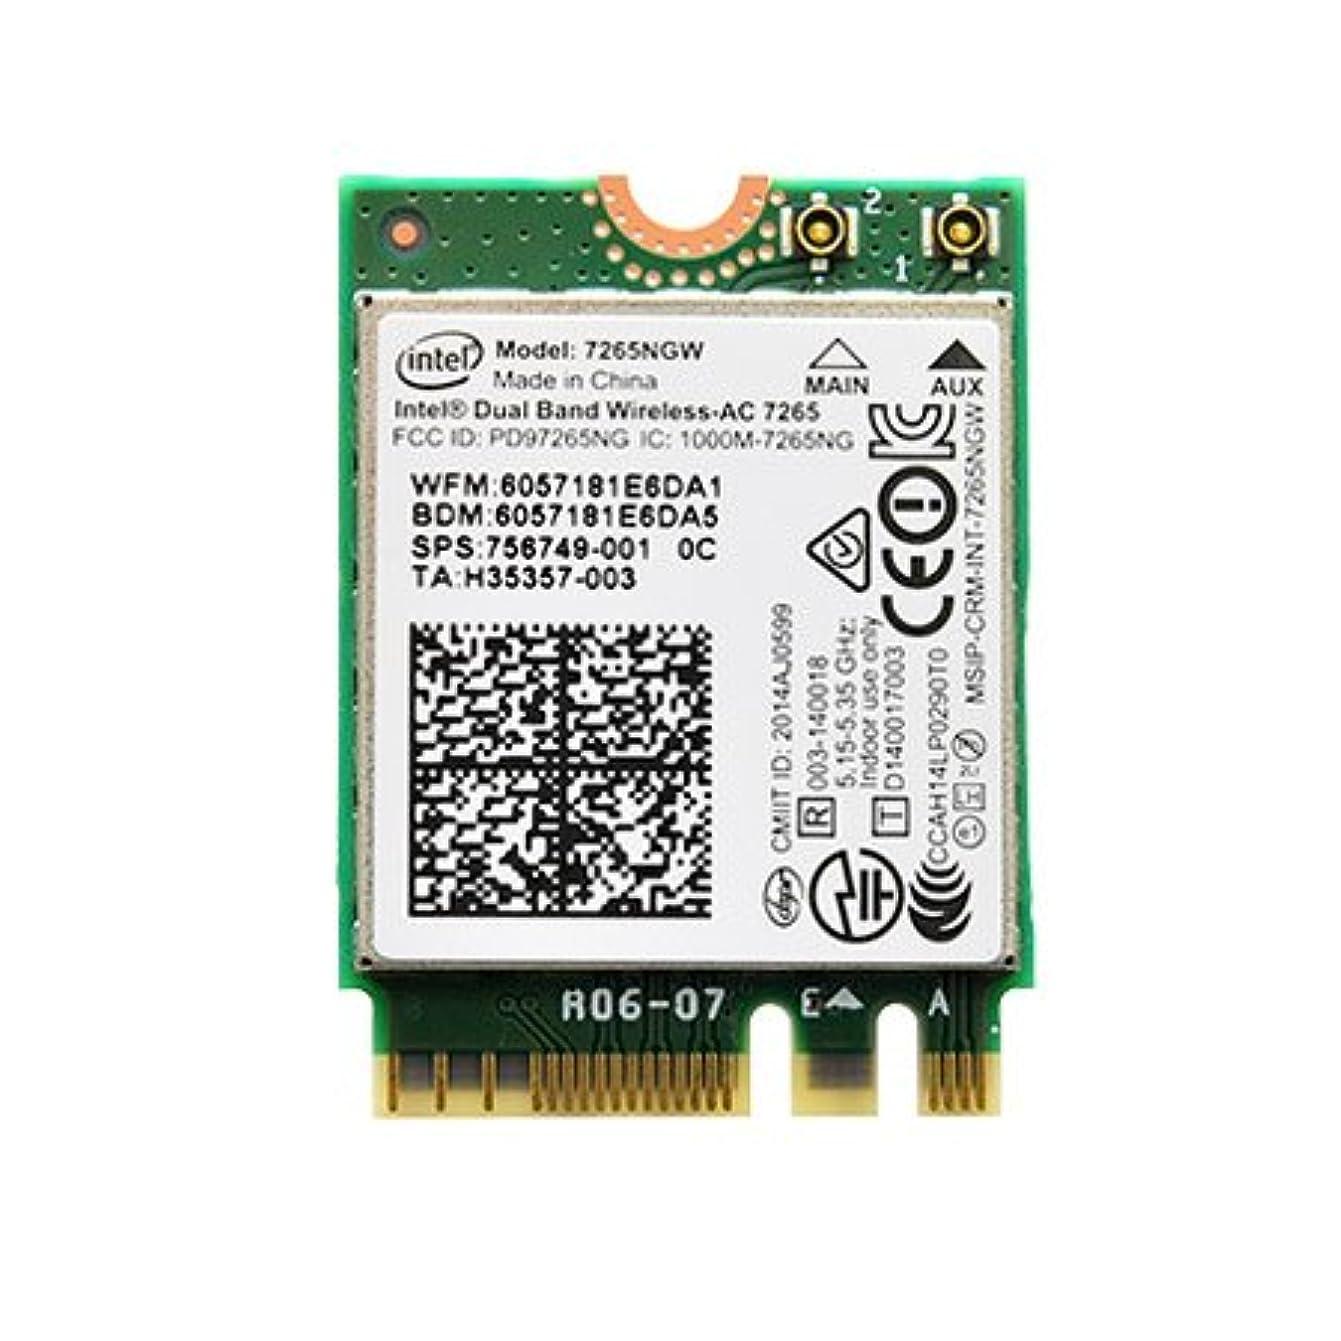 HP純正 756749-001 Intel Dual Band Wireless-AC 7265 867Mbps Dual Band 2x2 802.11ac + Bluetooth 4.0 M.2 無線LANカード 7265NGW for HP EliteBook 820 G2 840 G2 850 G2 720 G2 750 G2/HP ZBook 14 G2 15u G2/HP EliteBook Revolve 810 G3